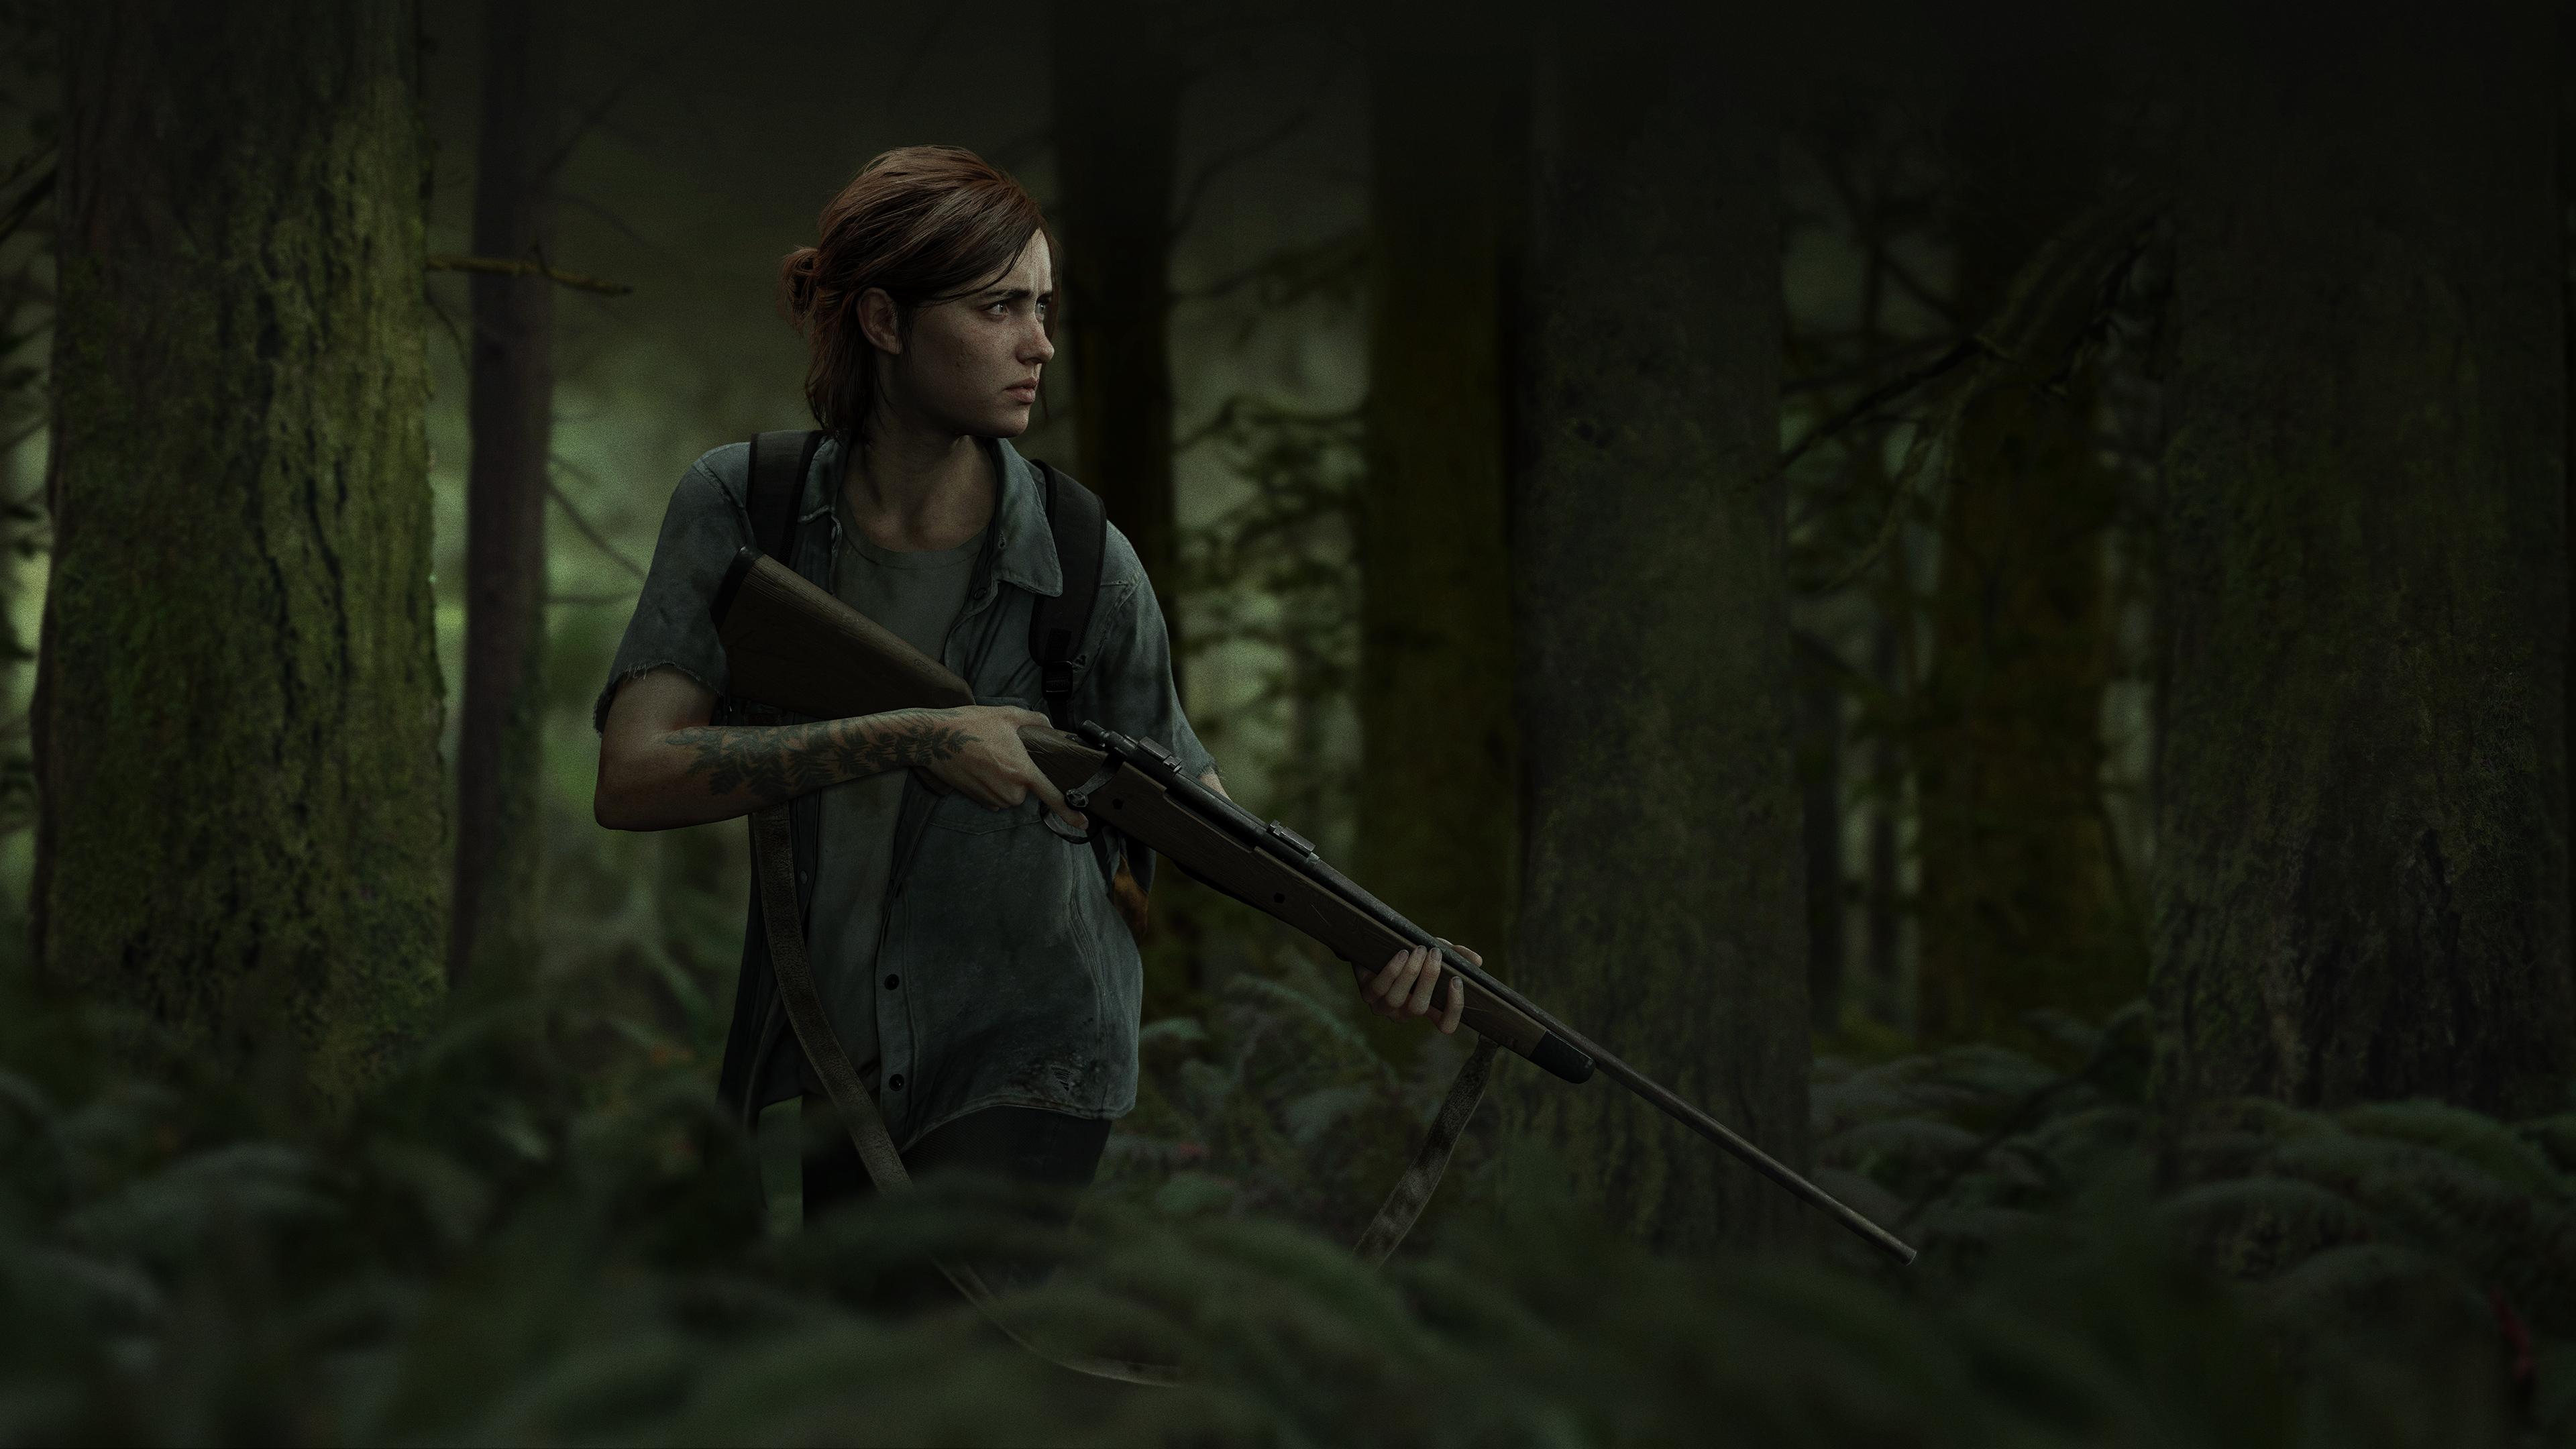 The Last Of Us Part Ii Ellie Outbreak Day 2018 4k Ultra